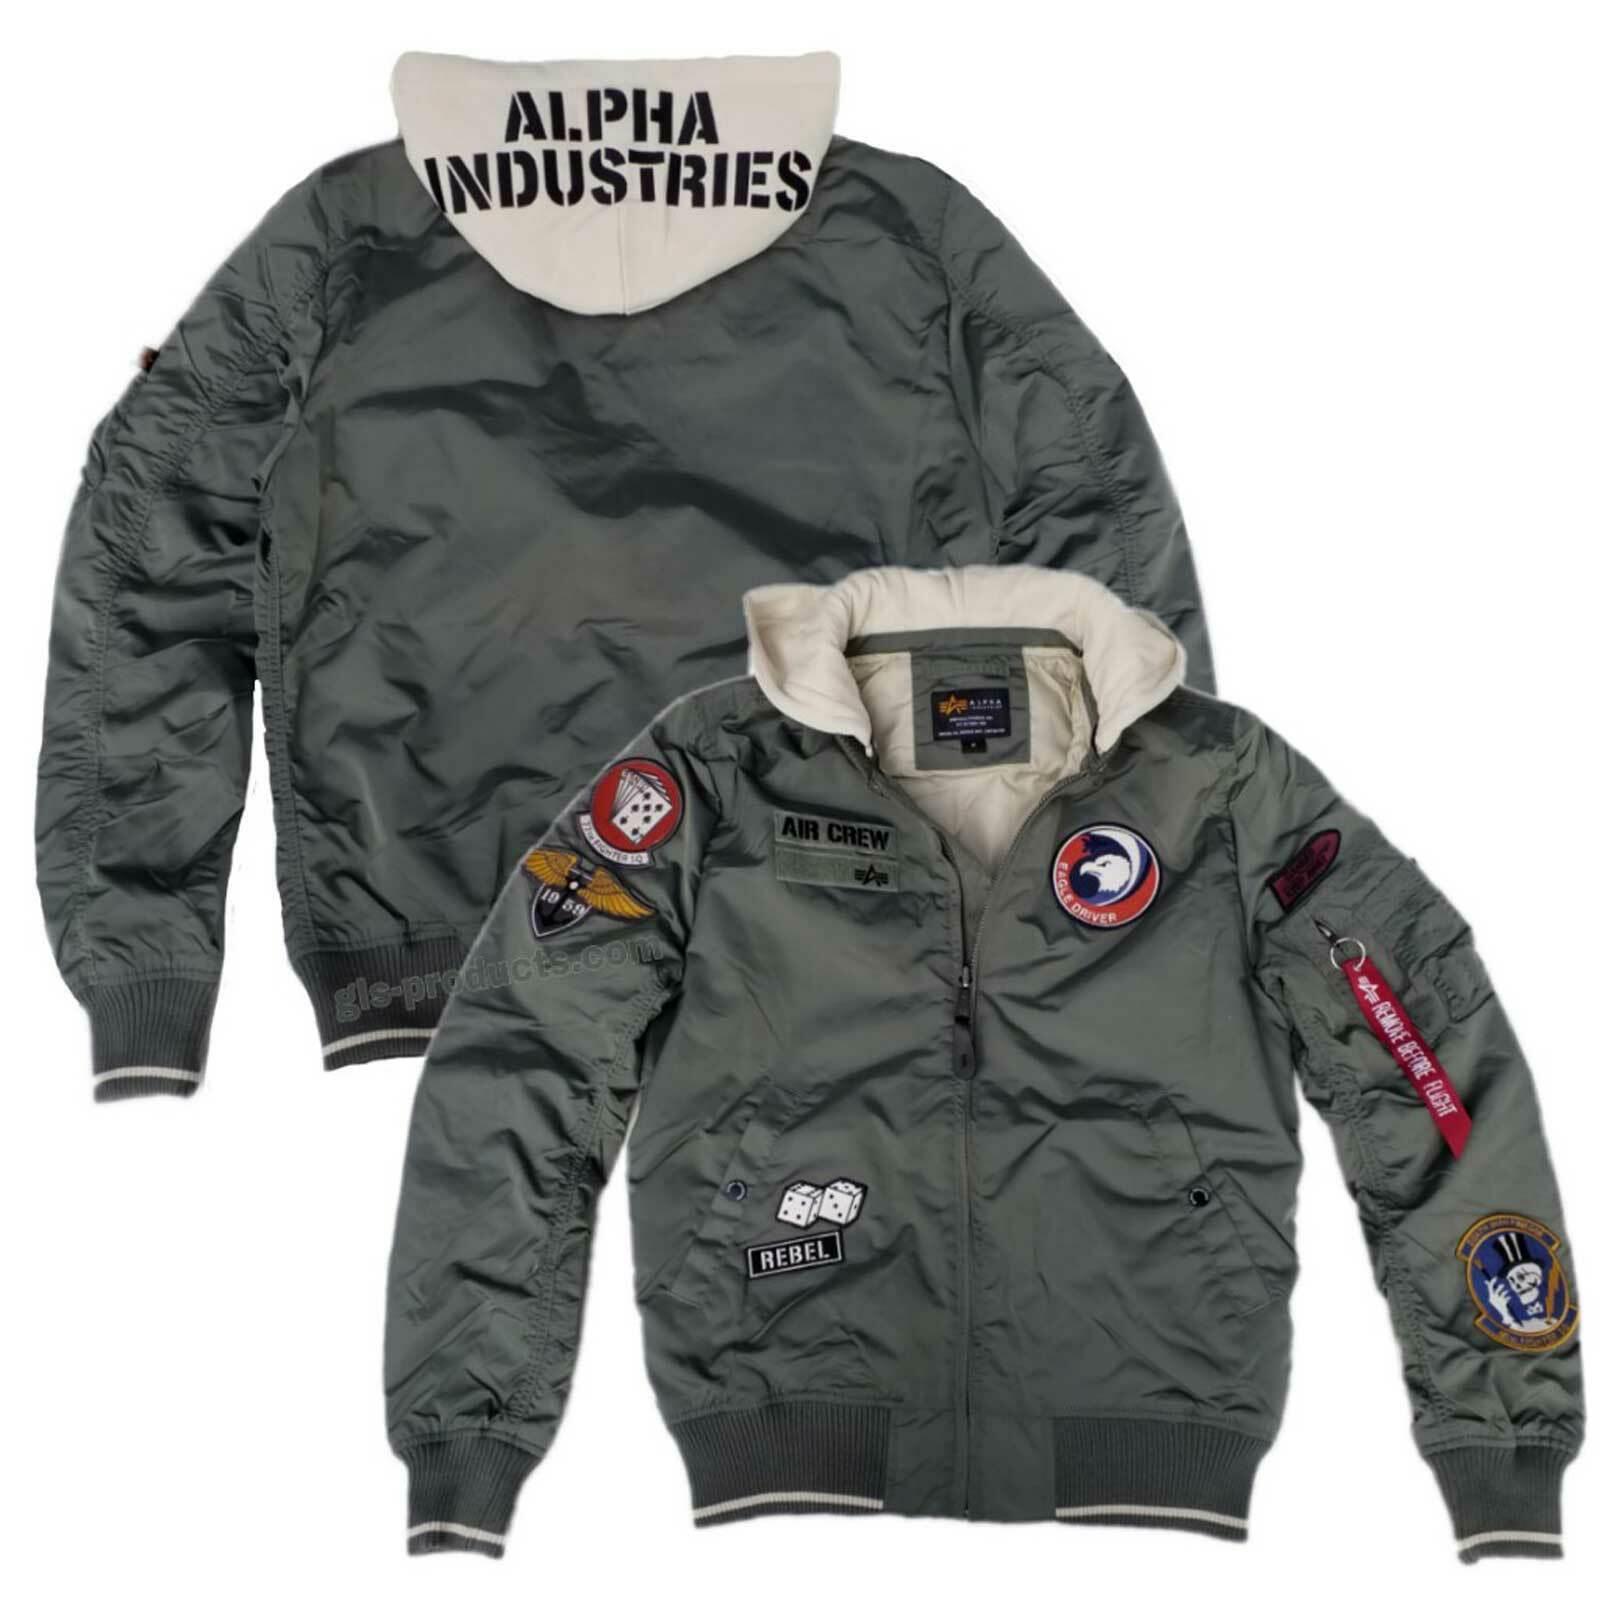 Alpha Industries MA-1 TT Hood Patch Patch Patch 196109 - Air Crew Nylon Kapuze abnehmbar Neu | Creative  a15c7d